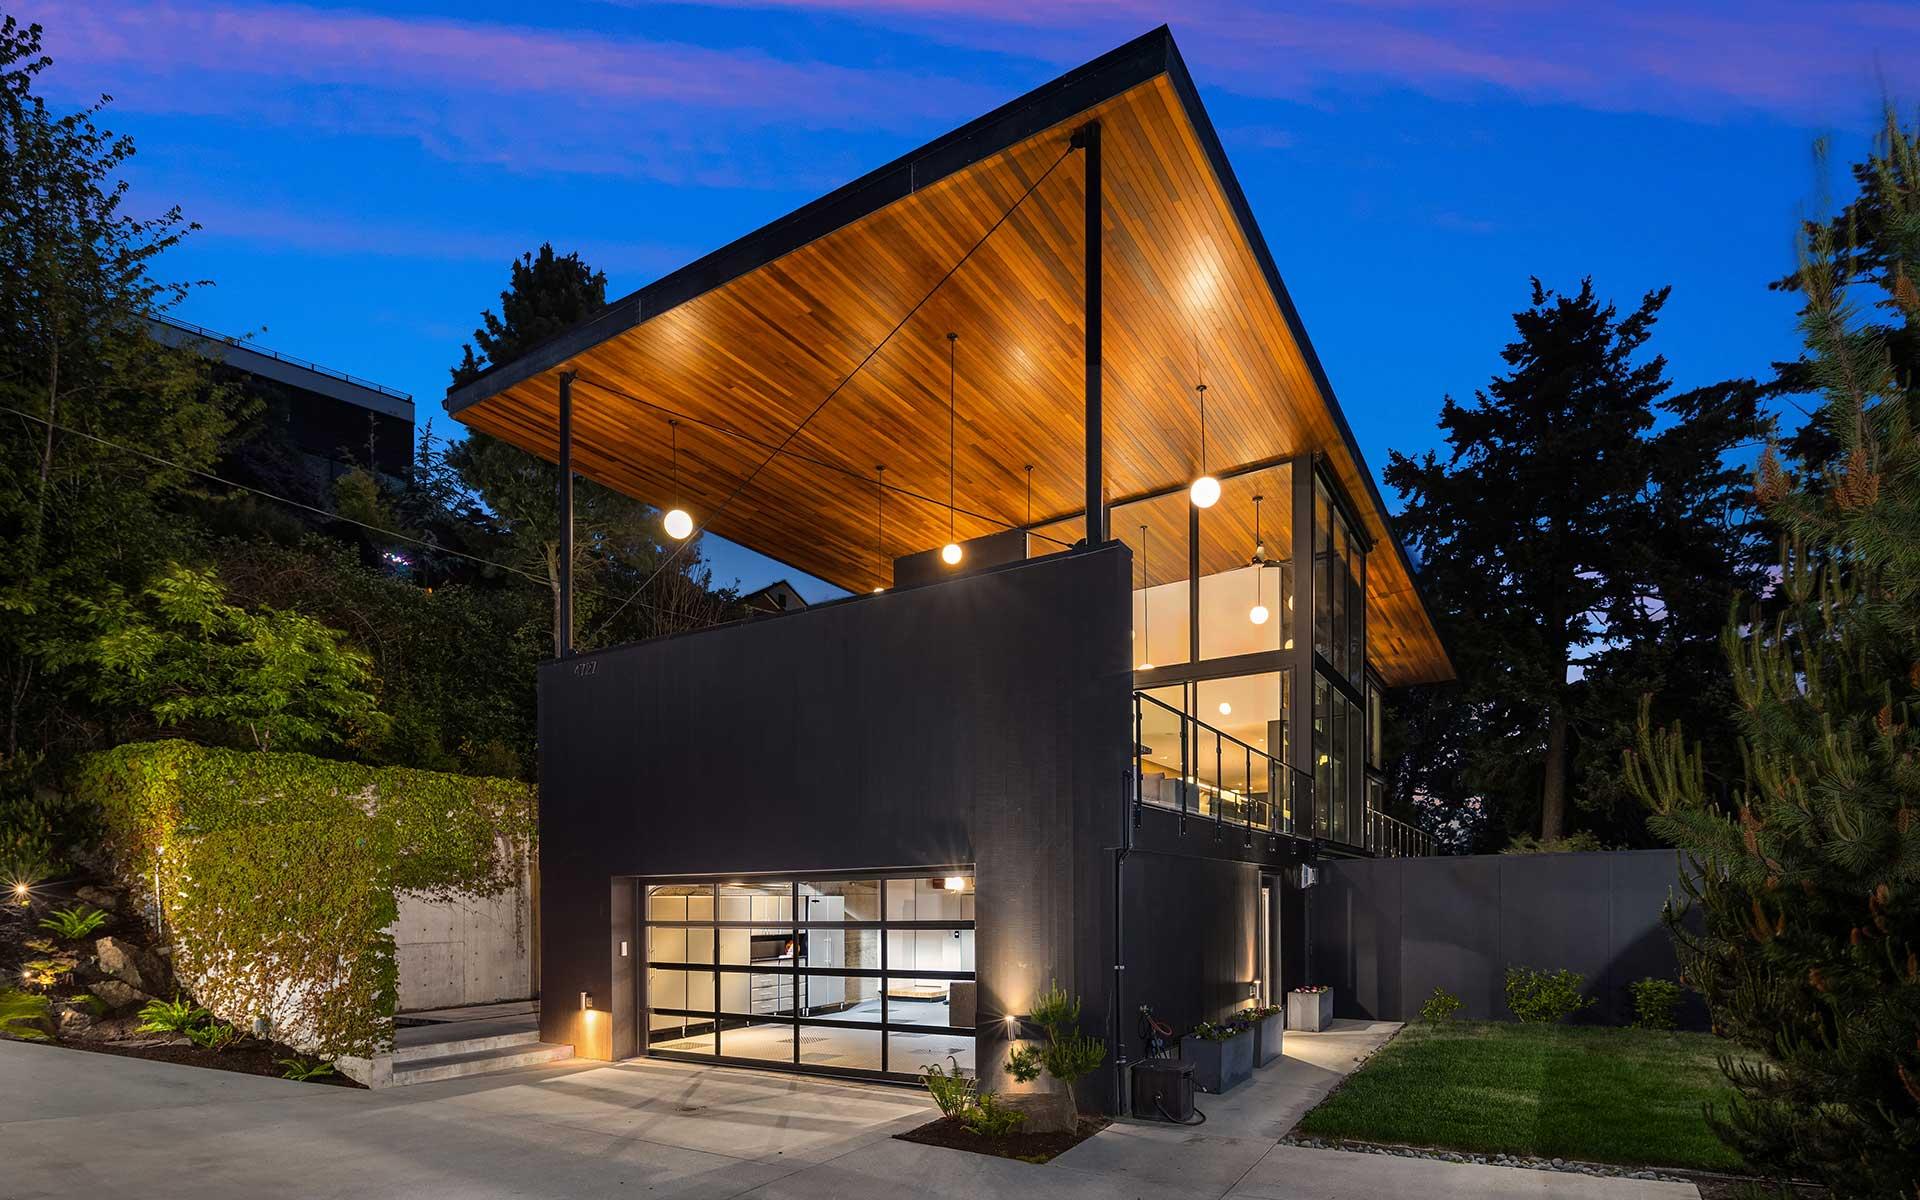 A Modern Sanctuary with Awe-Inspiring Views photo